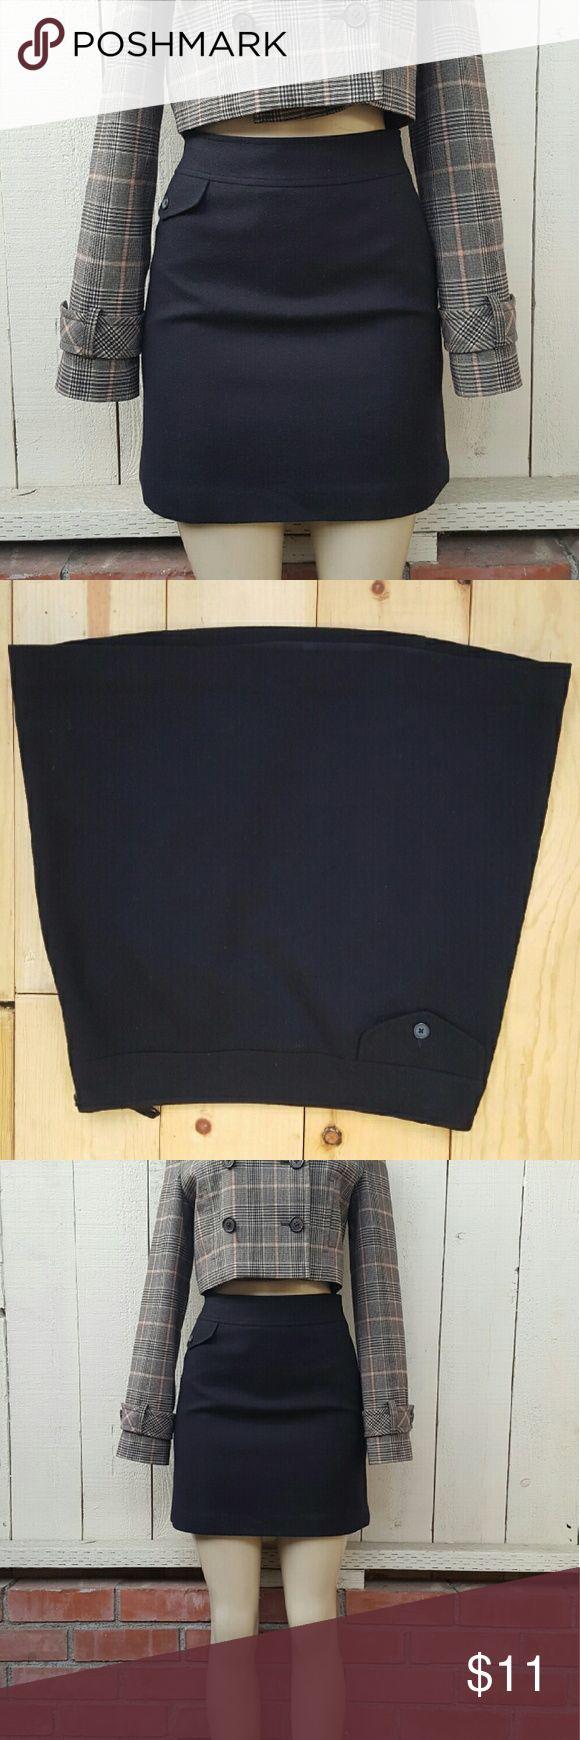 Banana Republic wool blend skirt size 4 Elegant mini black banana republic skirt size 4, zipper on the side, great used condition. Banana Republic Skirts Mini